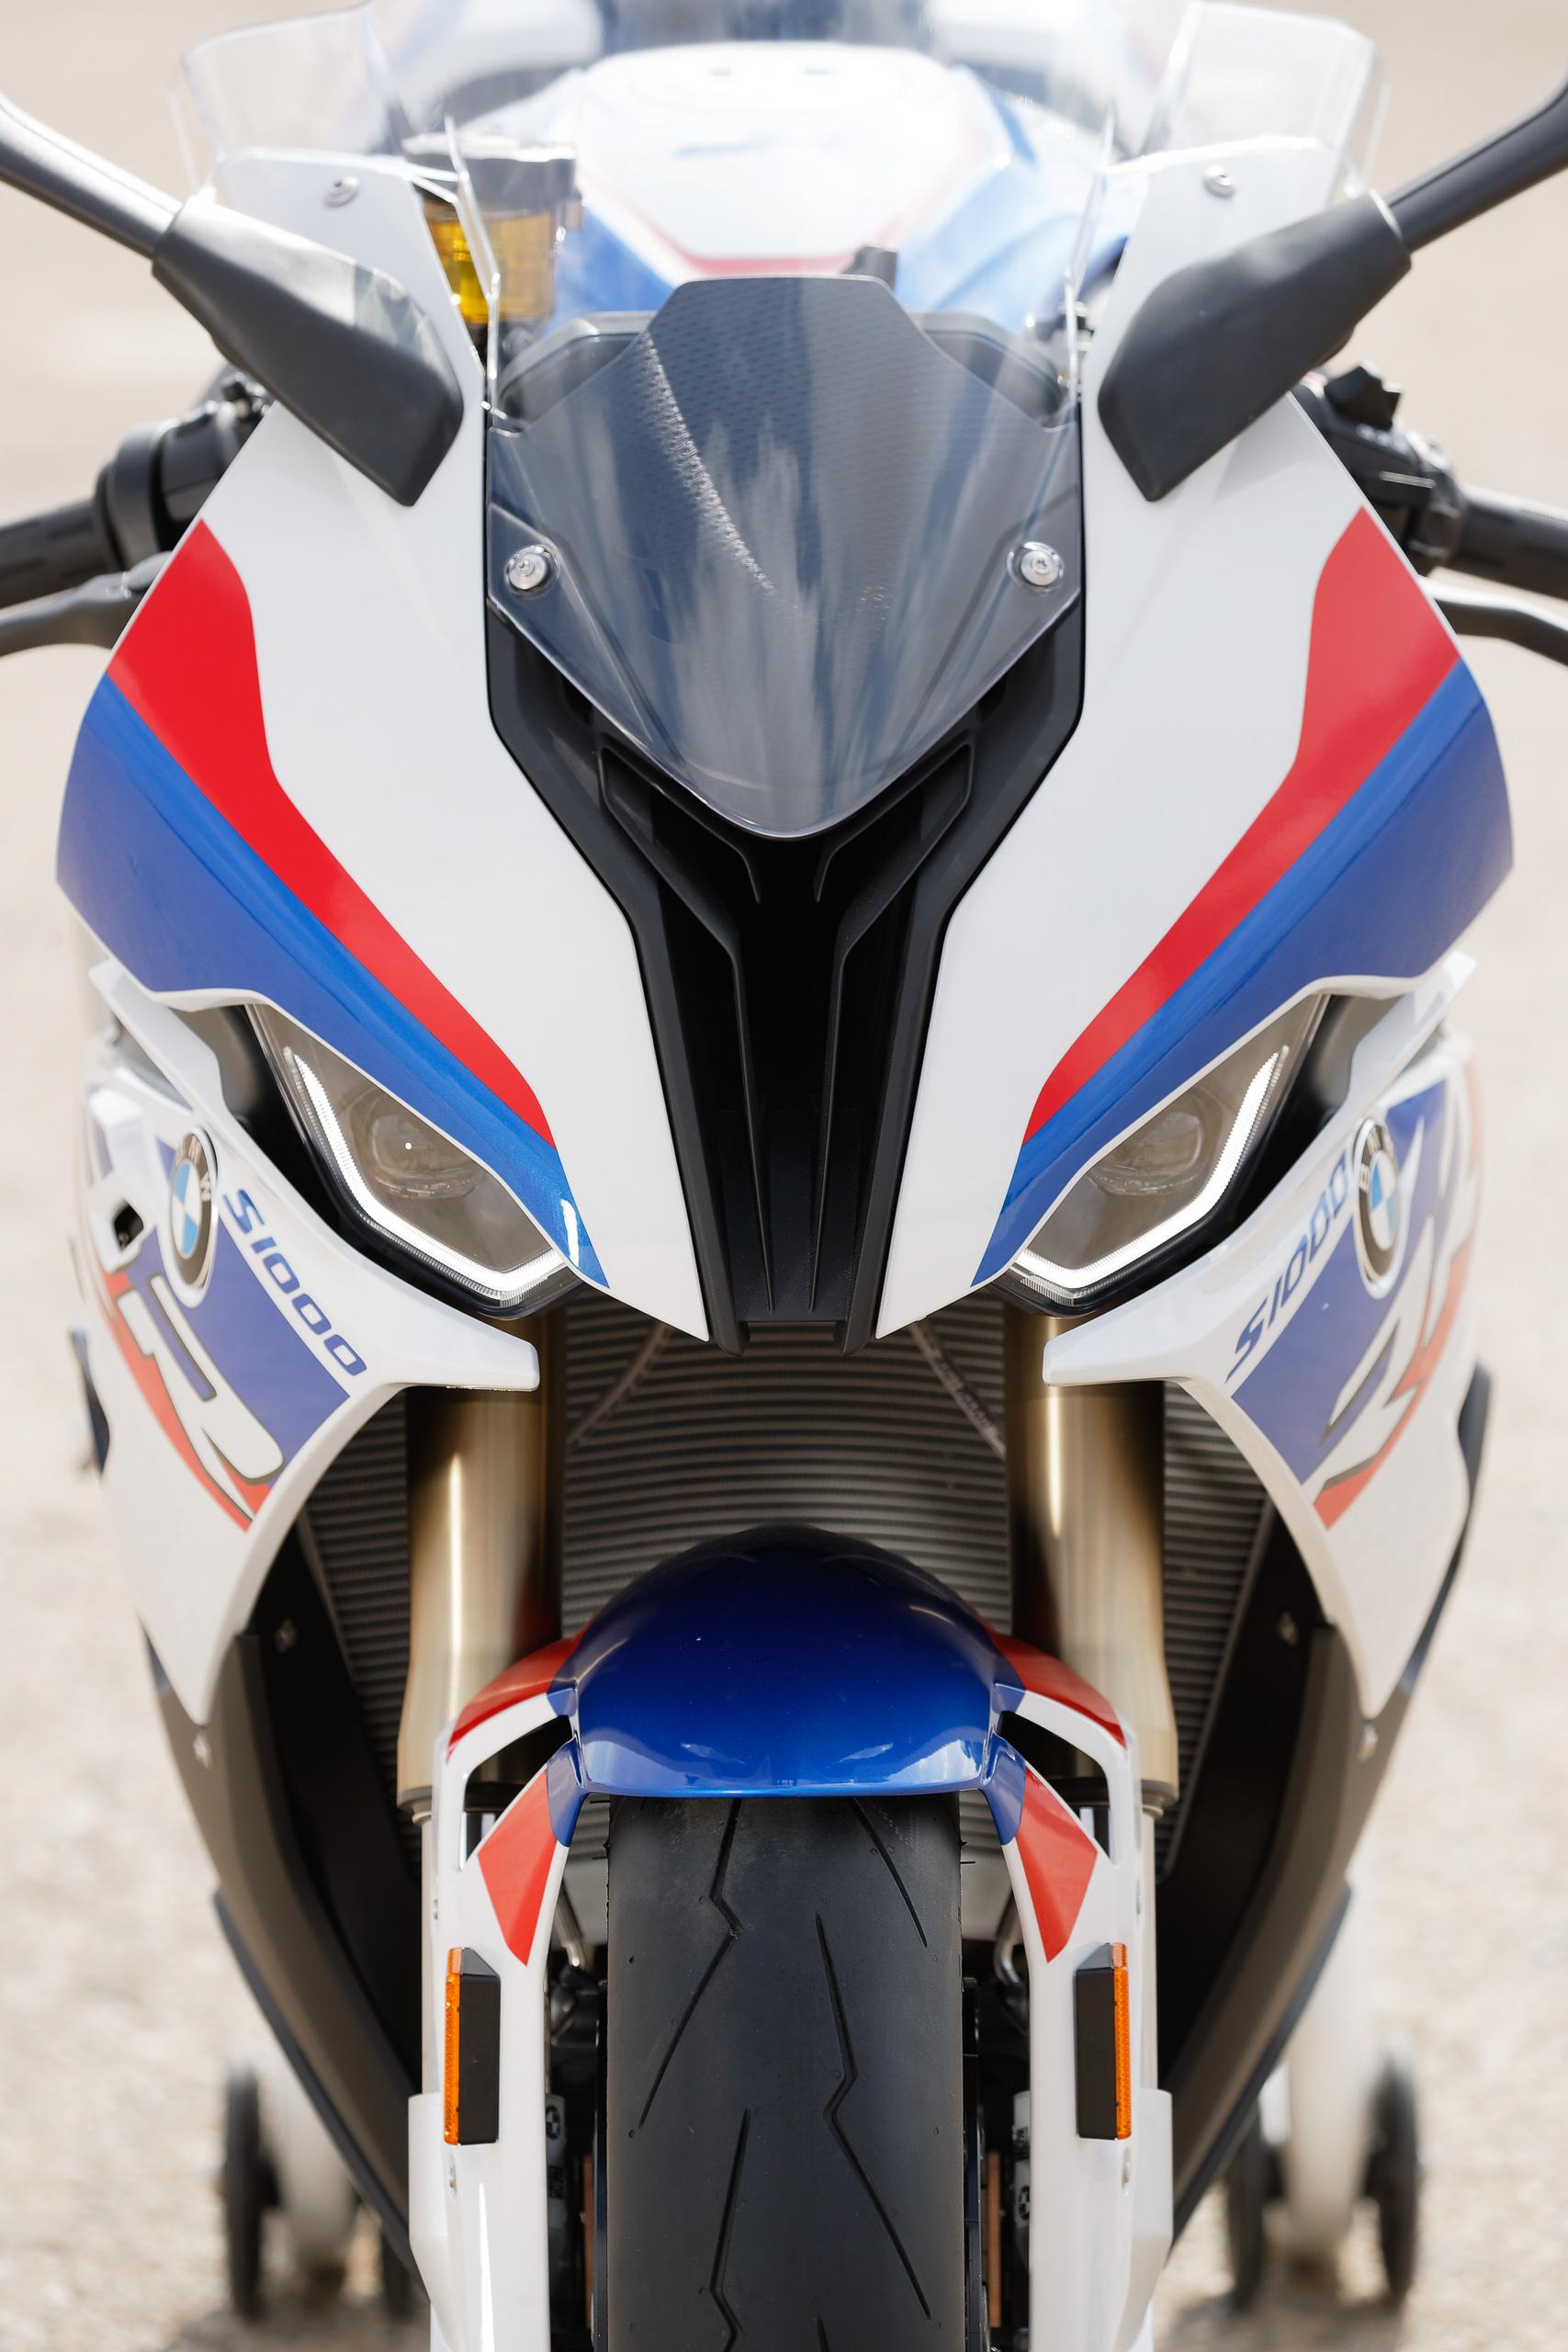 2018 Eicma 2019 Bmw Motorrad S 1000 Rr Shown Paul Tan Image 884900